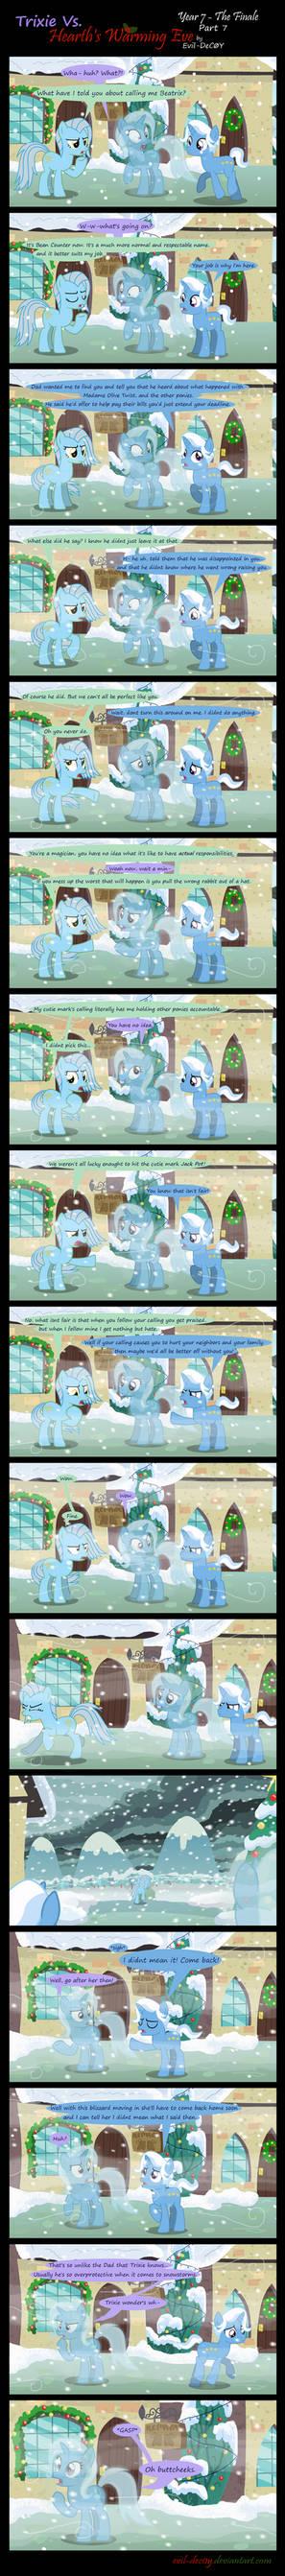 Trixie Vs. Hearth's Warming Eve: Finale (Part 7) by Evil-DeC0Y